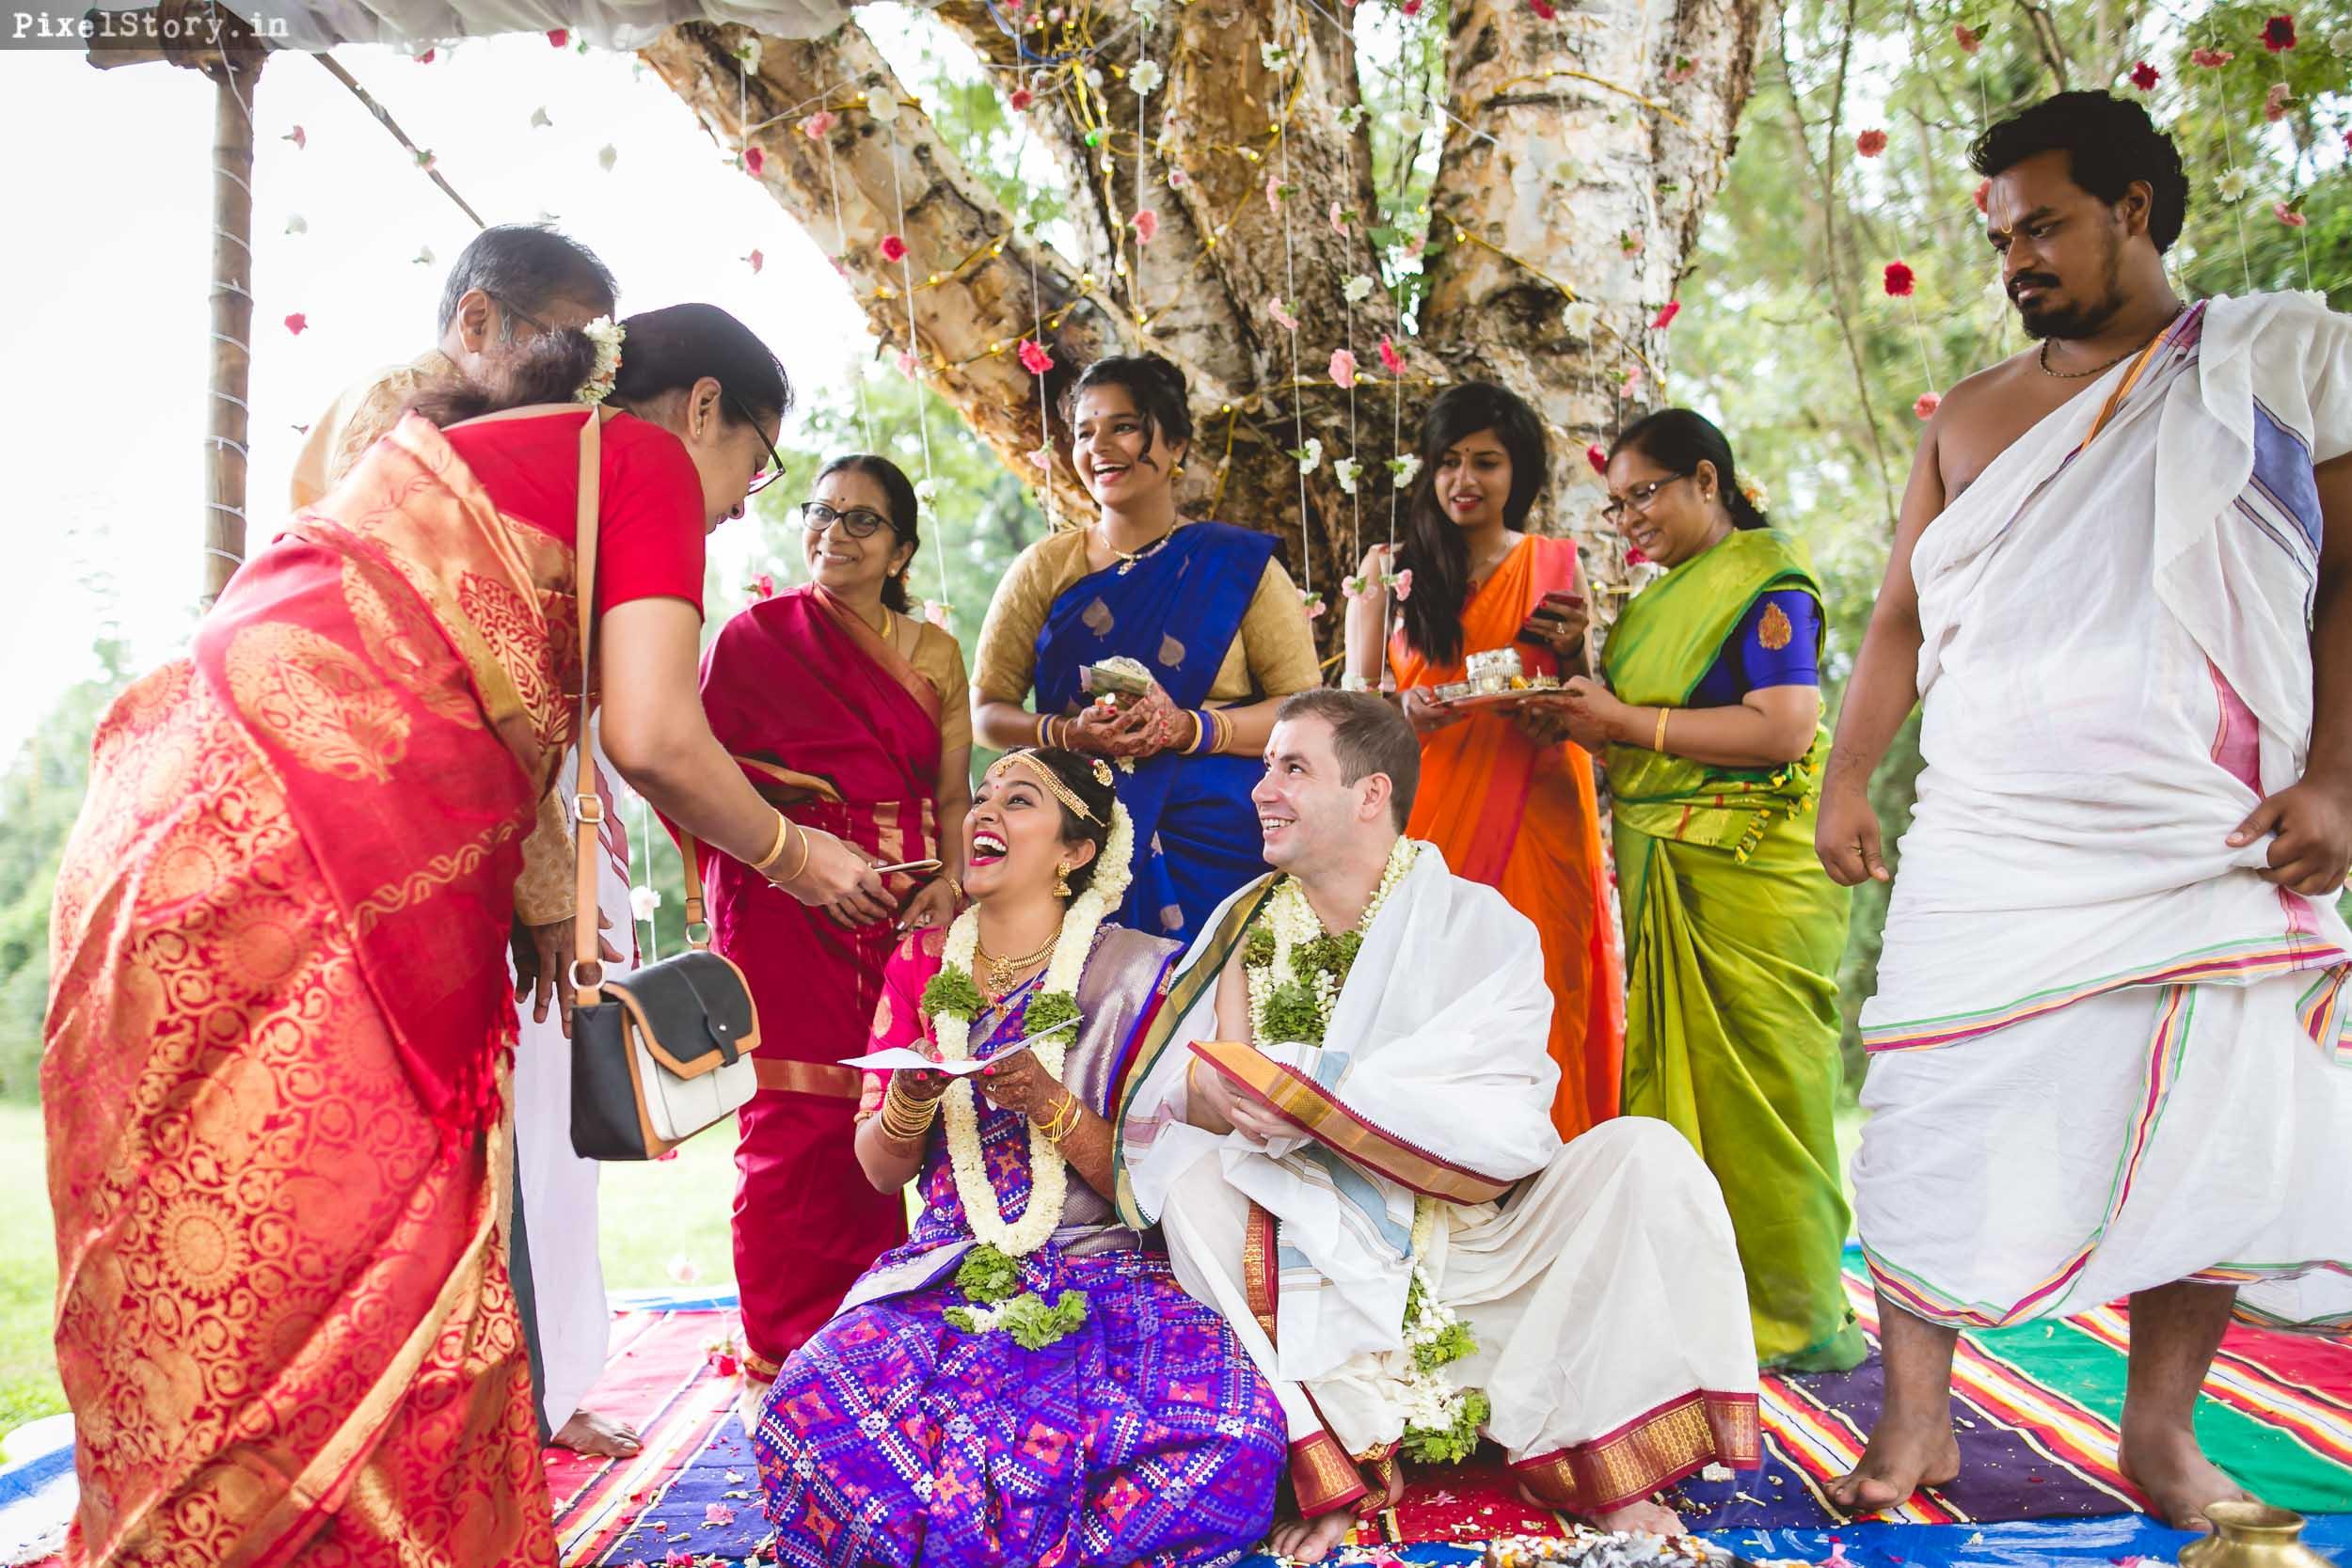 PixelStory-Jungle-Wedding-Photographer-Masinagudi-Indo-French081.jpg